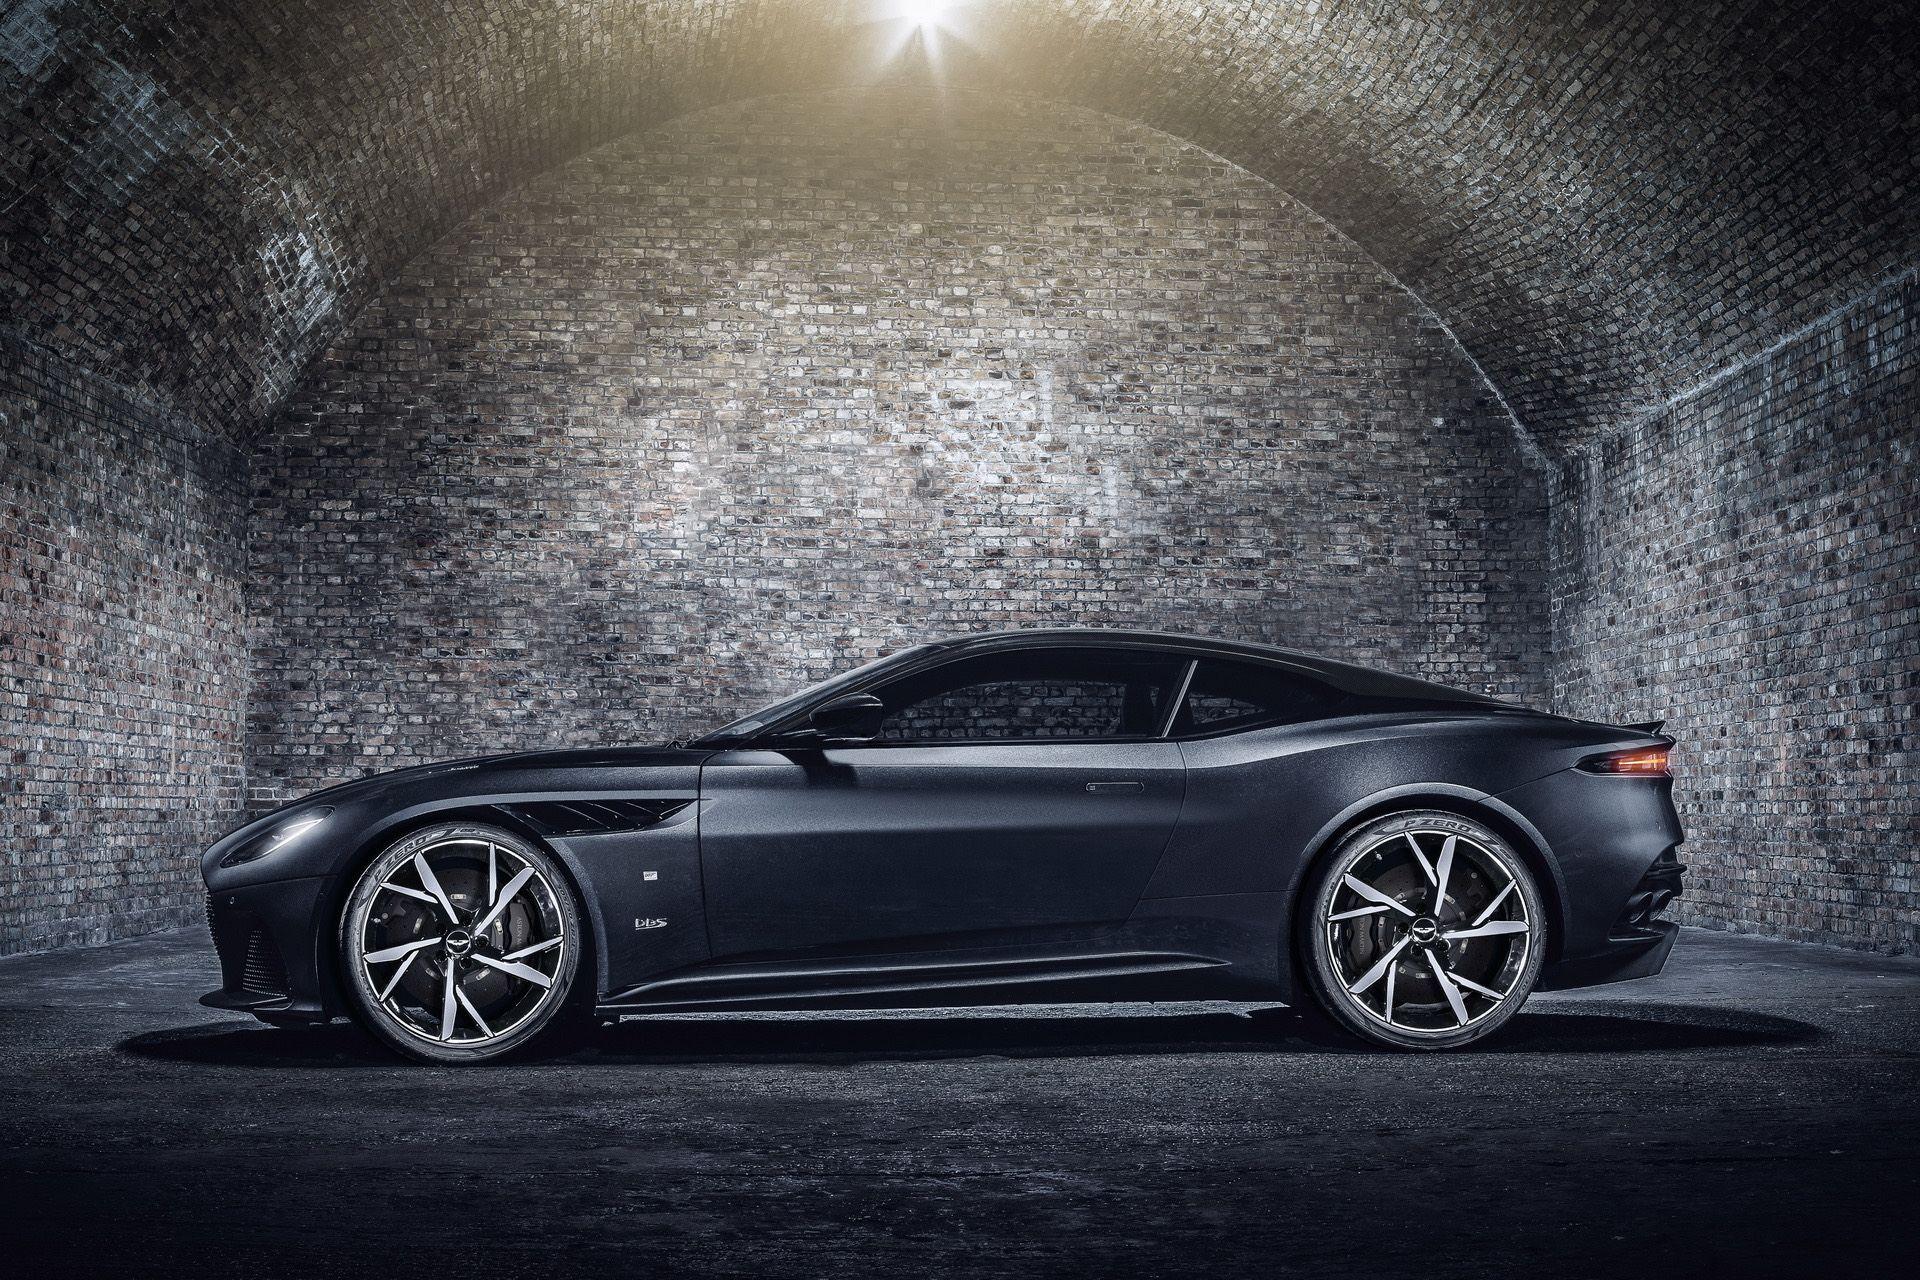 2021-aston-martin-dbs-superleggera-007-edition-3